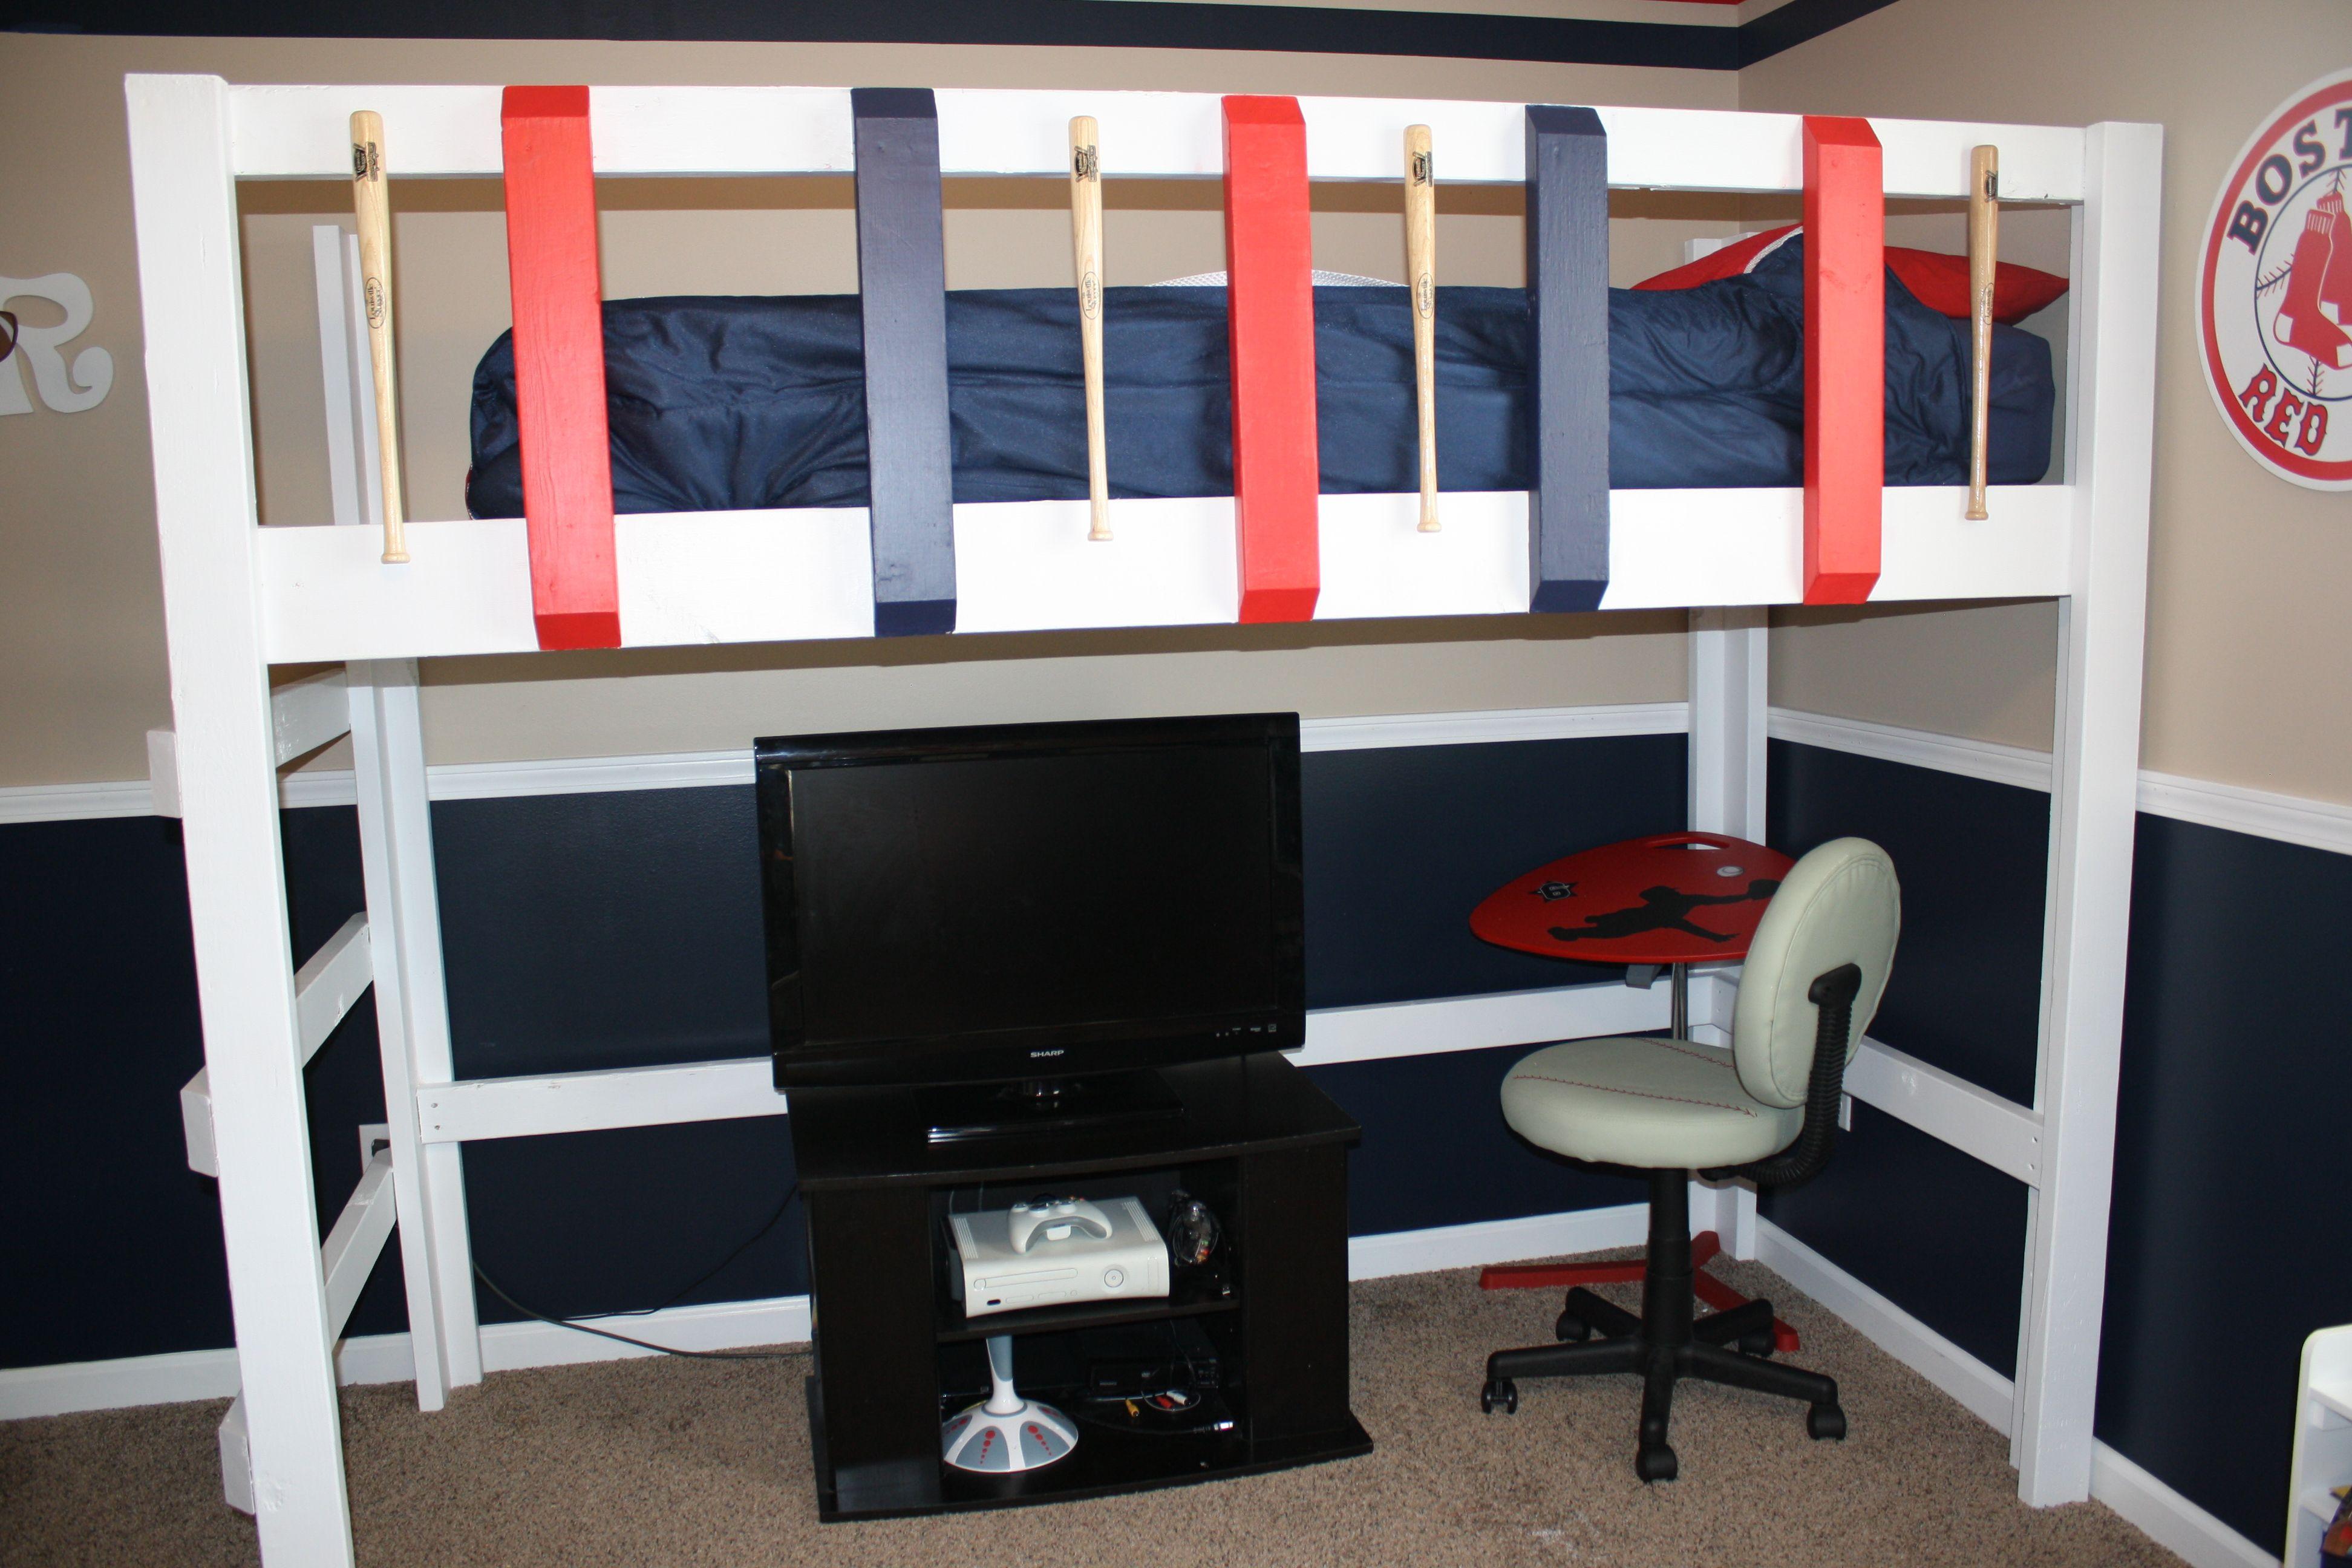 Baseball bat loft bed boston red sox theme 10yr old boy for Boston red sox bedroom ideas